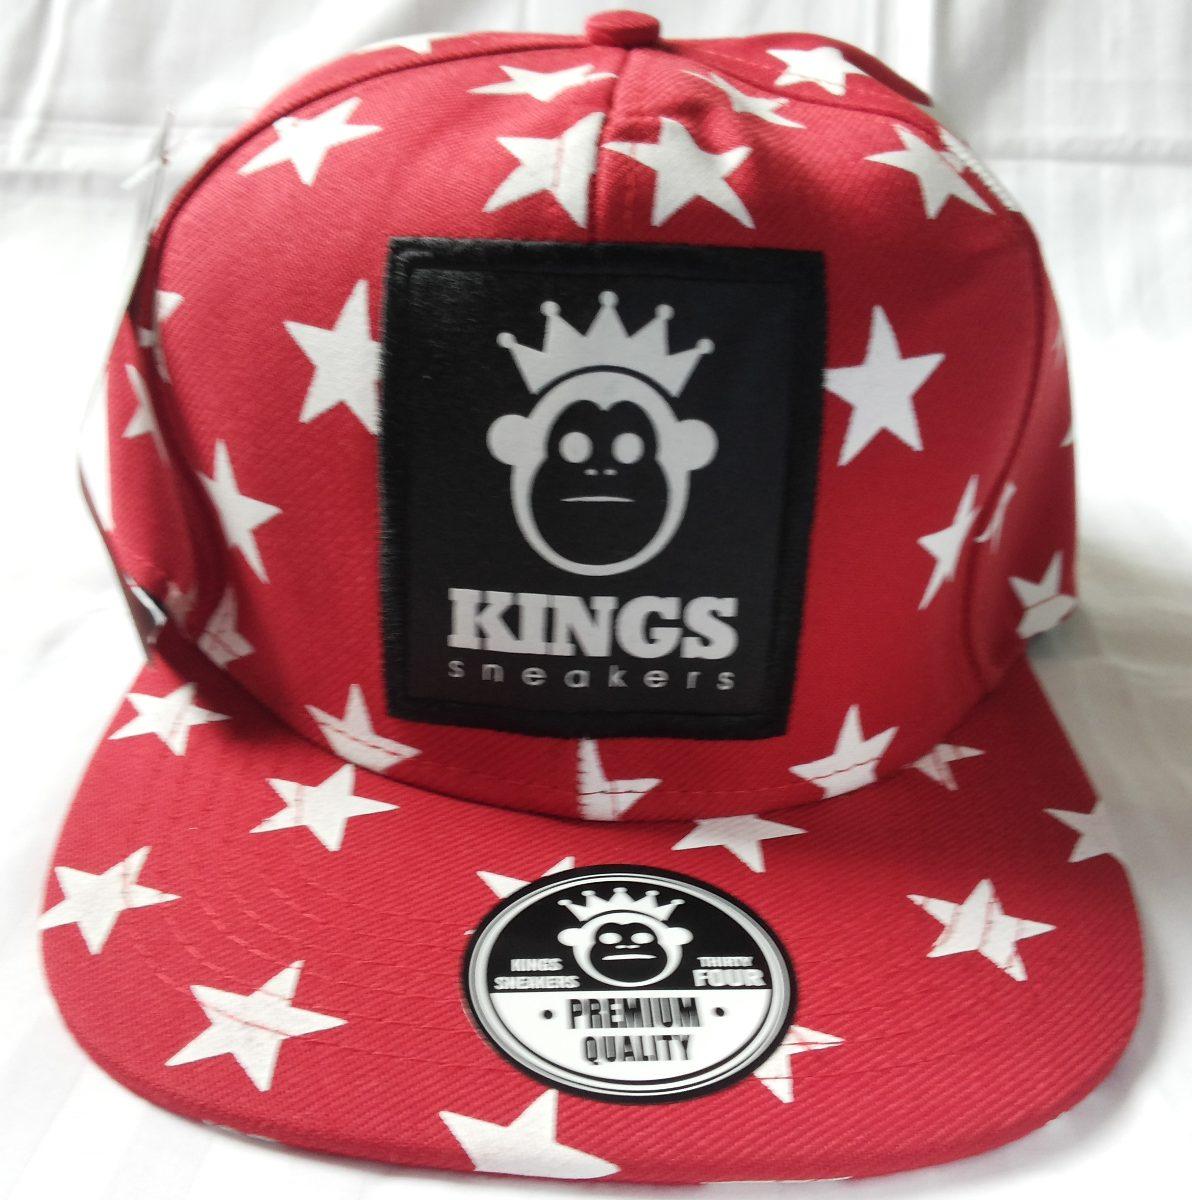 a37637392f4db Boné Aba Reta Kings Star Monkey Vermelho Branco Estrelado - R  65